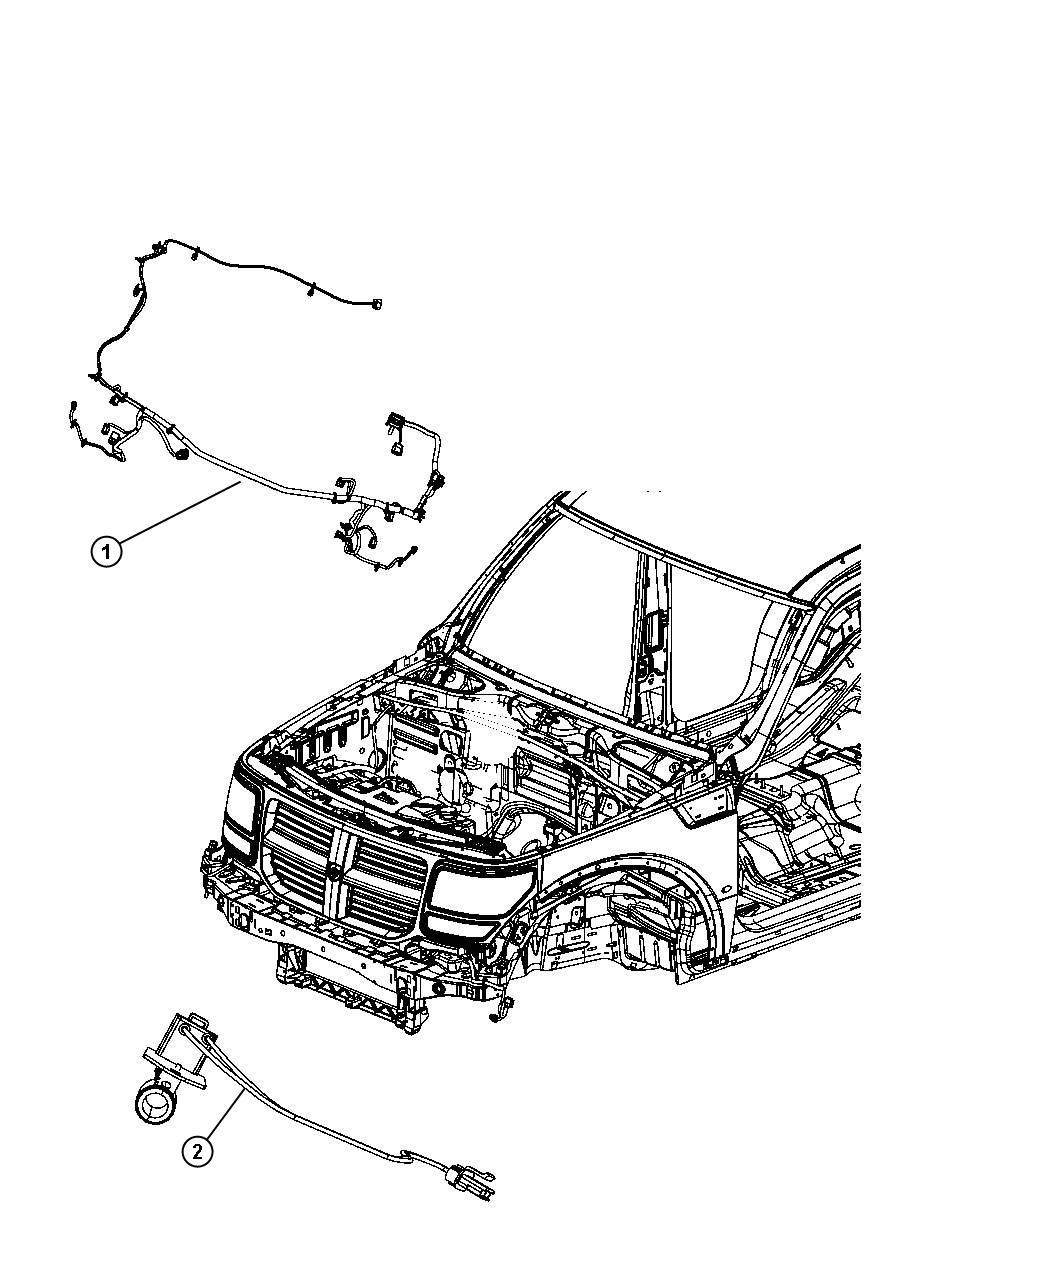 2008 Dodge NITRO Wiring. Front end lighting. Export